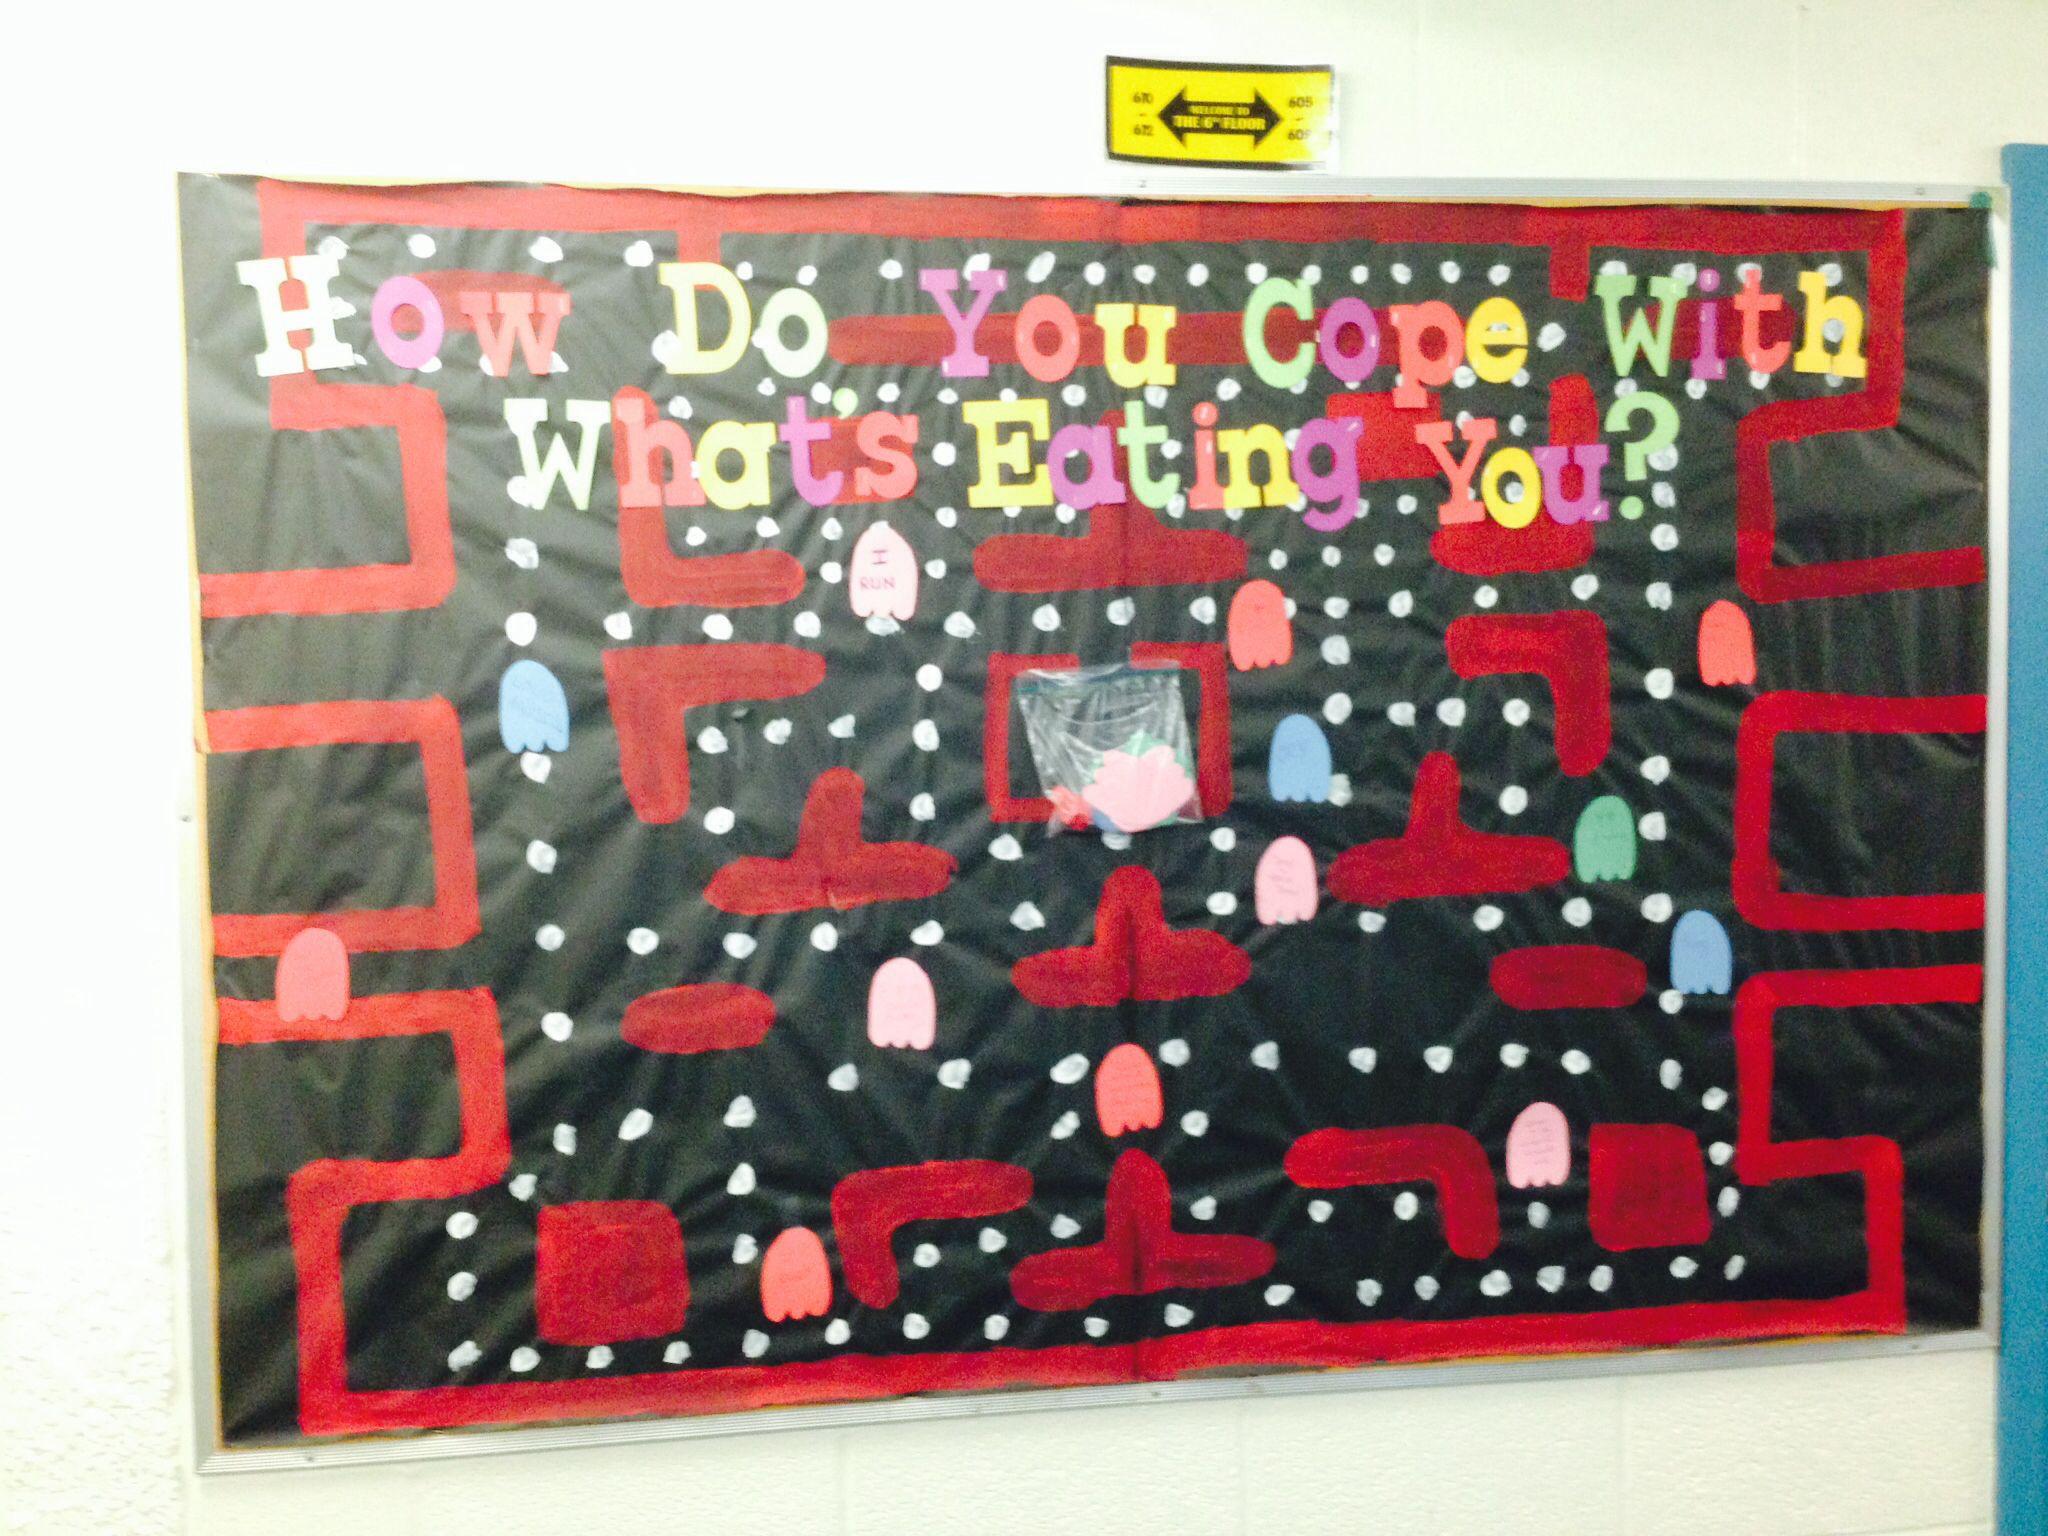 PAC man themed - coping skills board